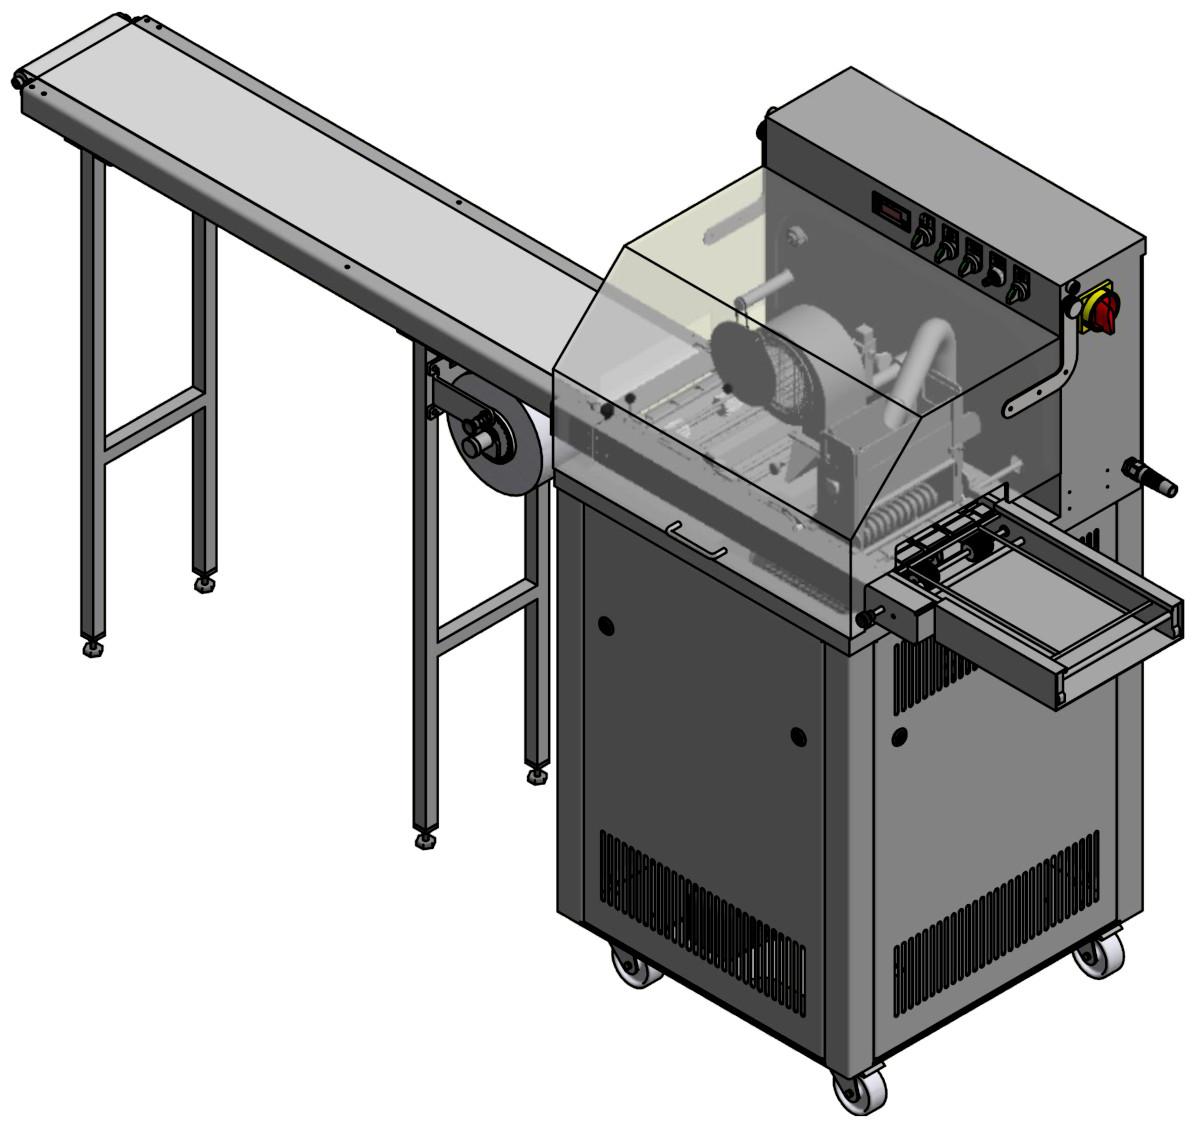 LCM 21000 106 Überzugsmaschine 180 ATC S 1.2m Papierband